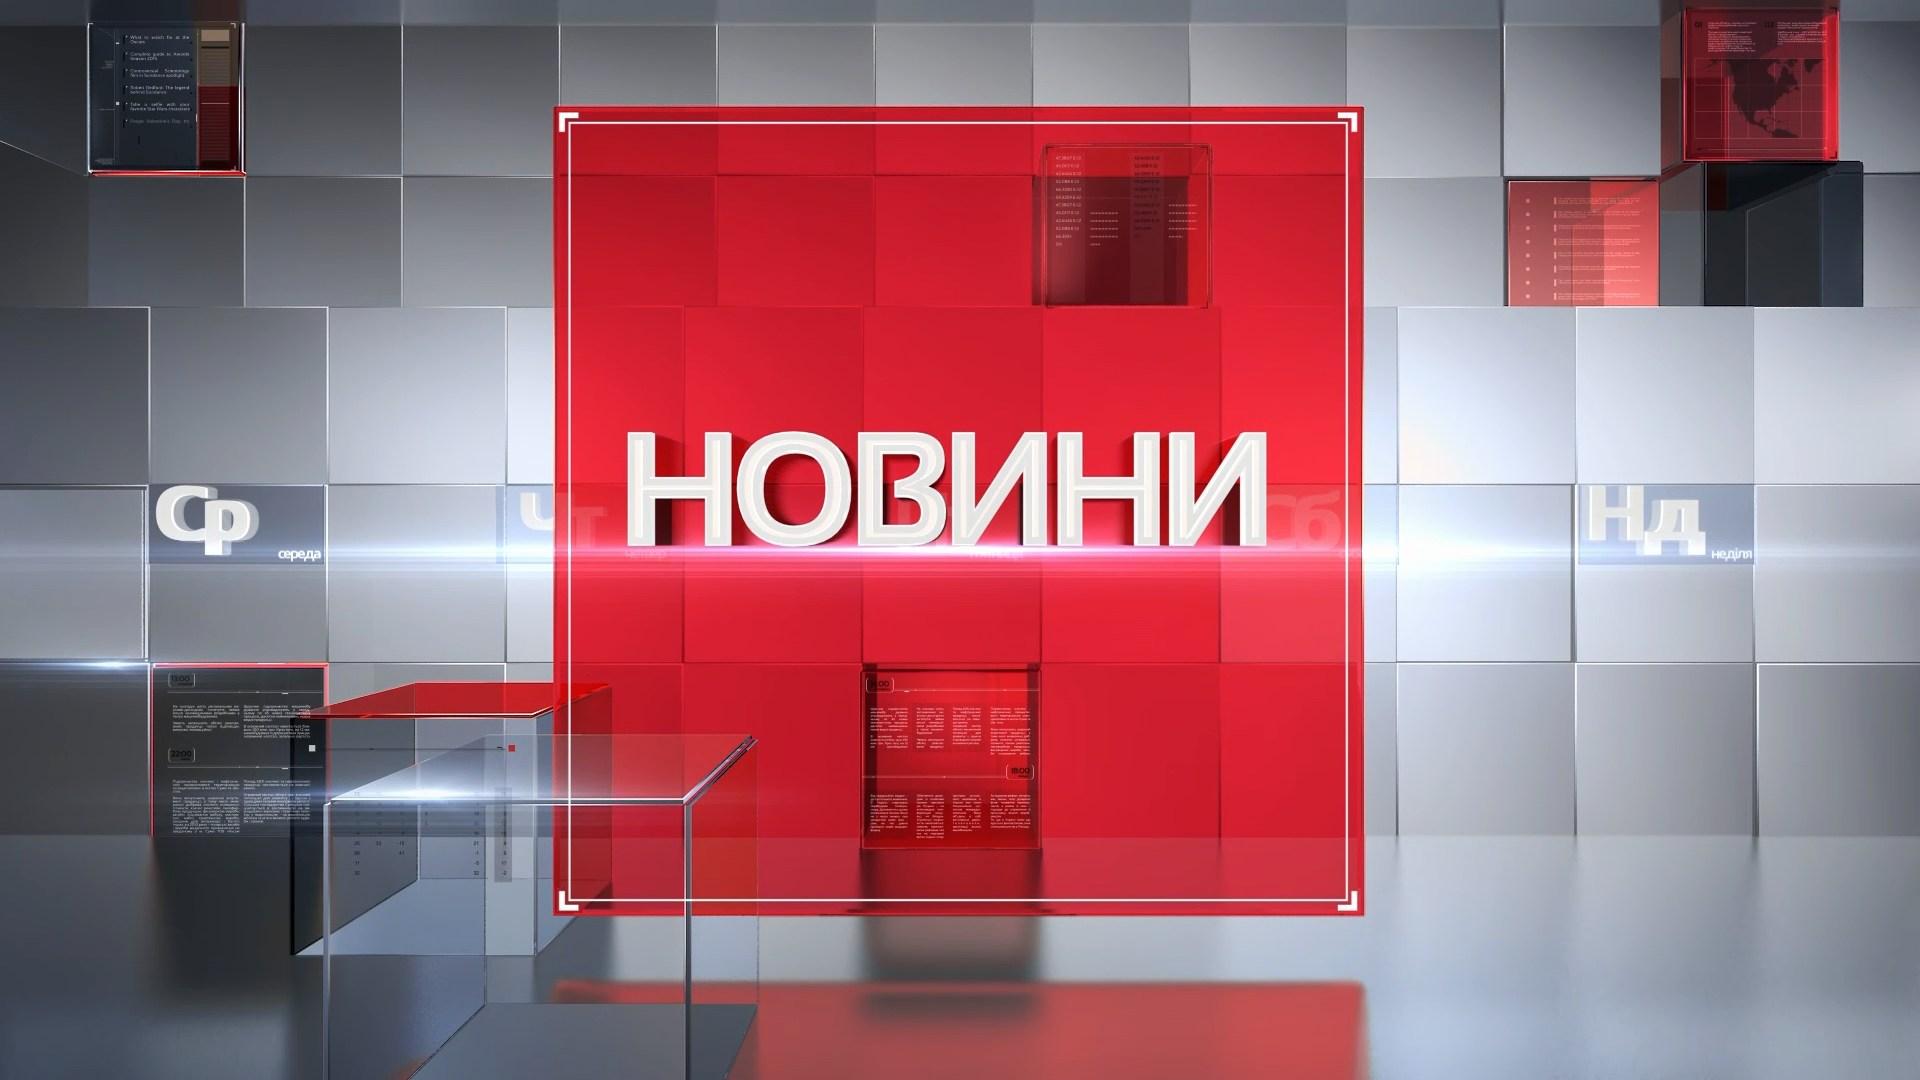 СТС_Новости_звук.mp4_snapshot_00.18_[2015.07.20_11.31.43]